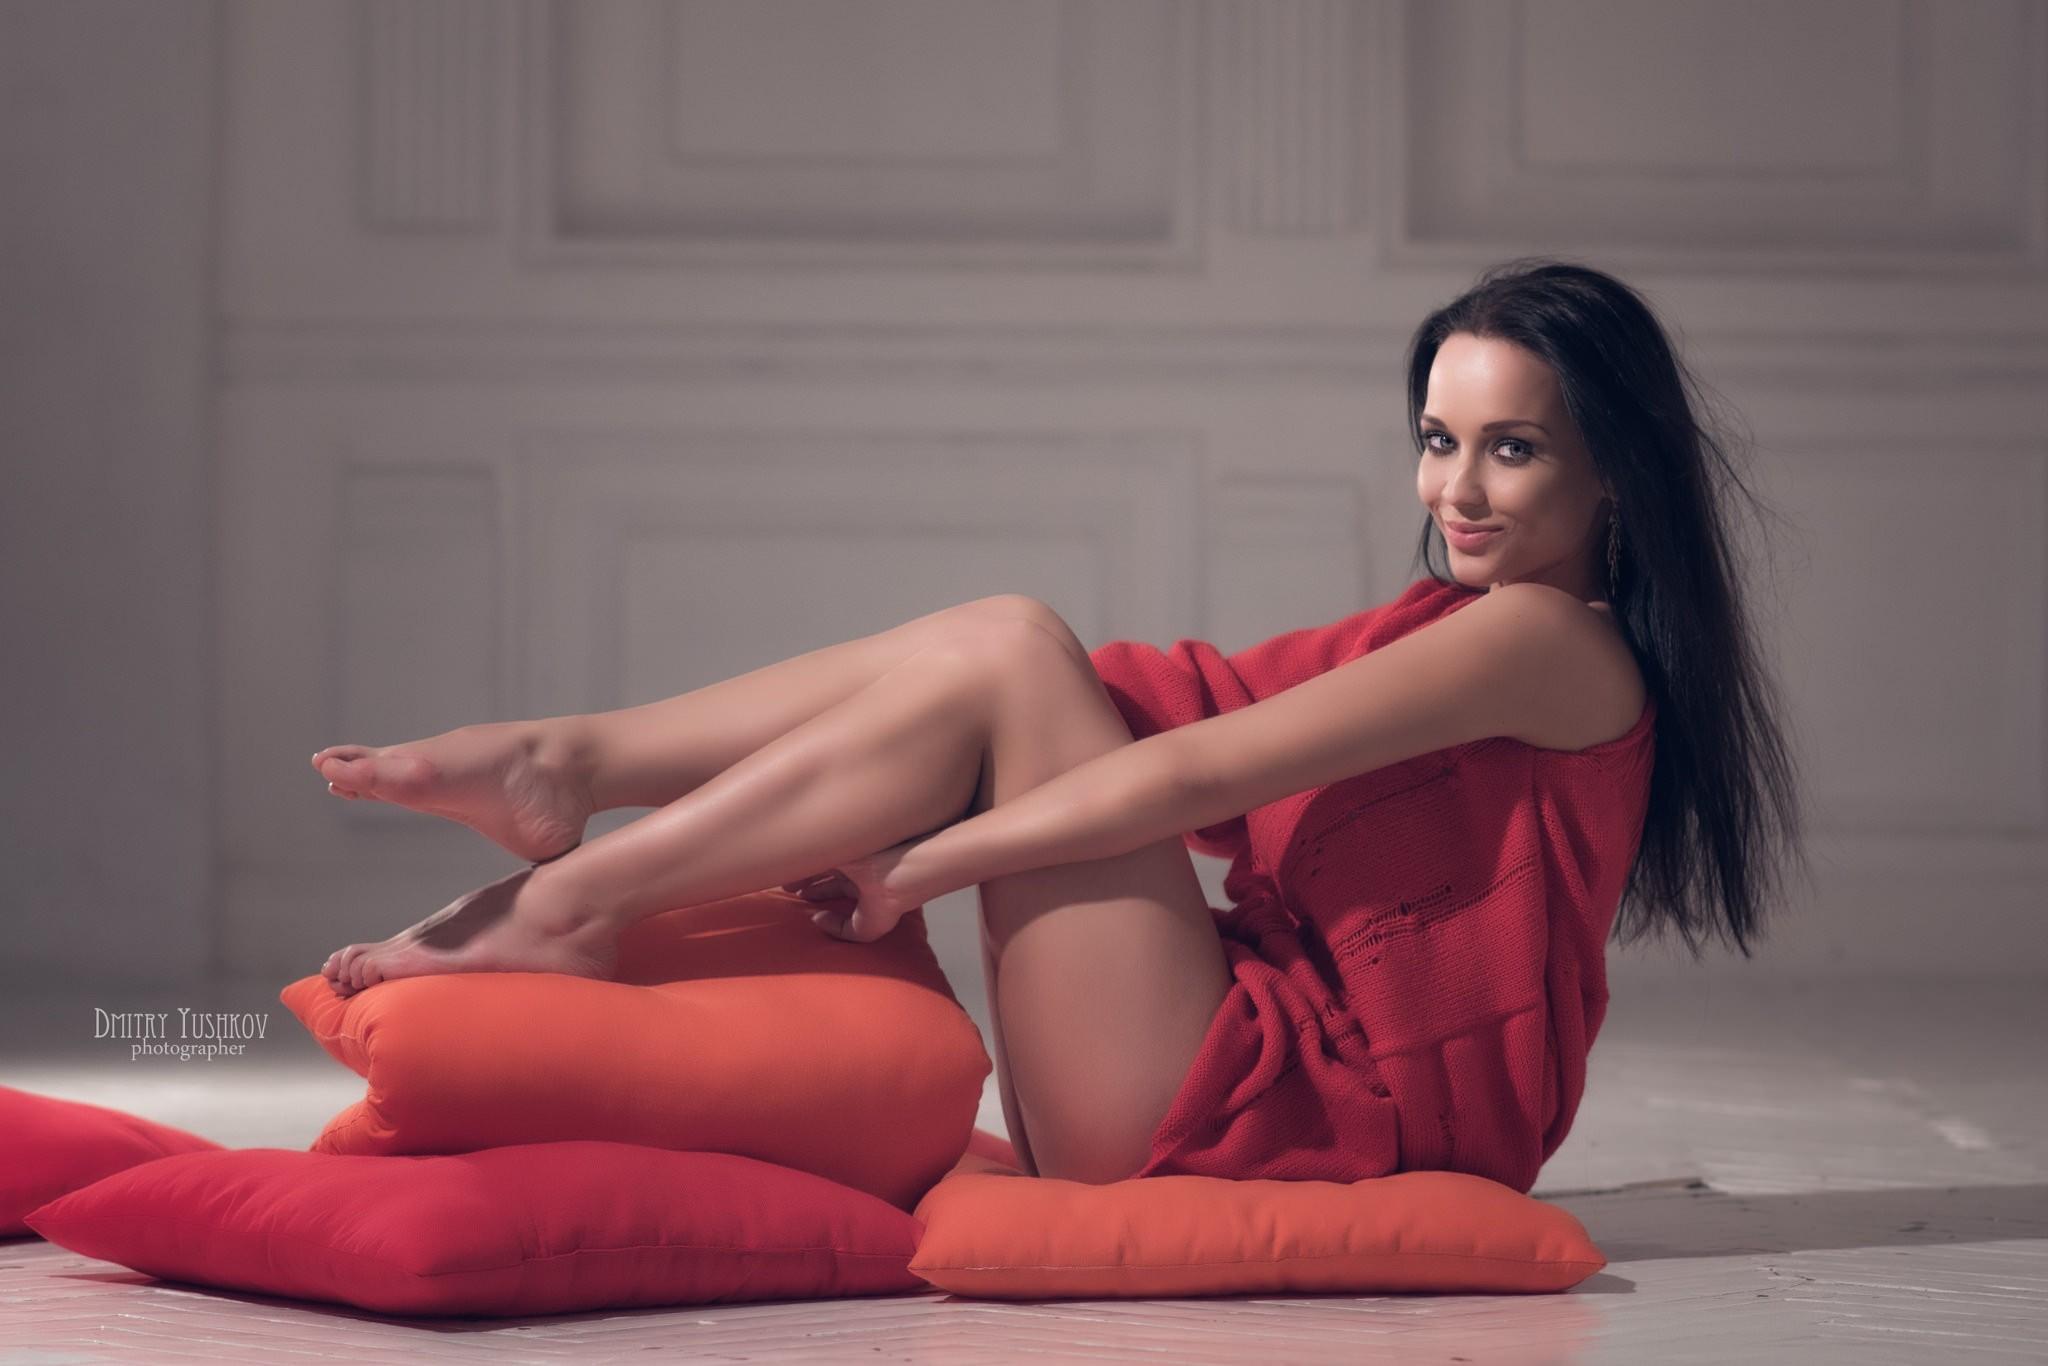 People 2048x1366 women Angelina Petrova smiling sitting portrait Dmitry Yushkov tiptoe